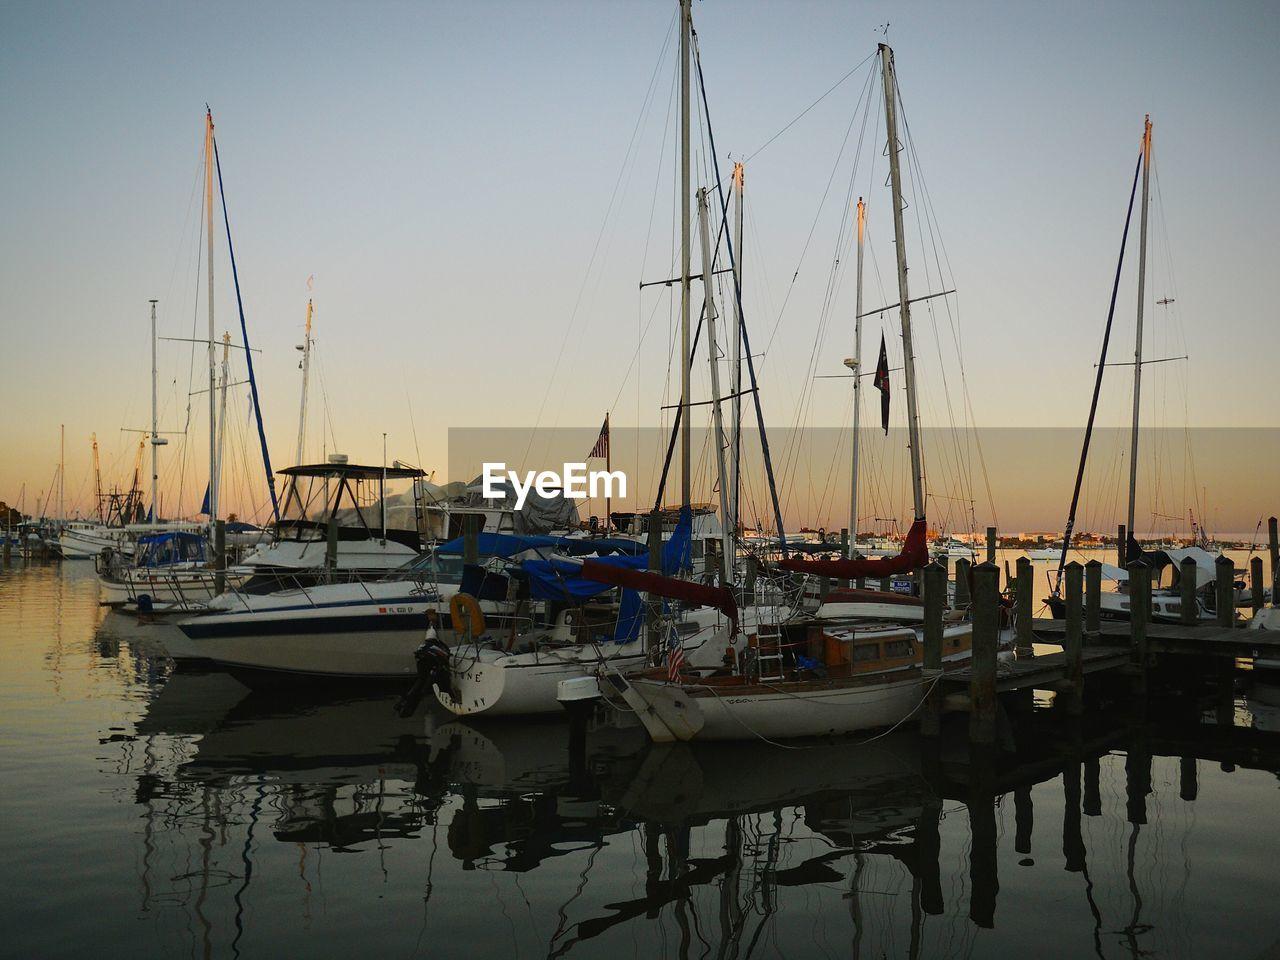 Sailboats Moored At Marina Against Sky During Sunset